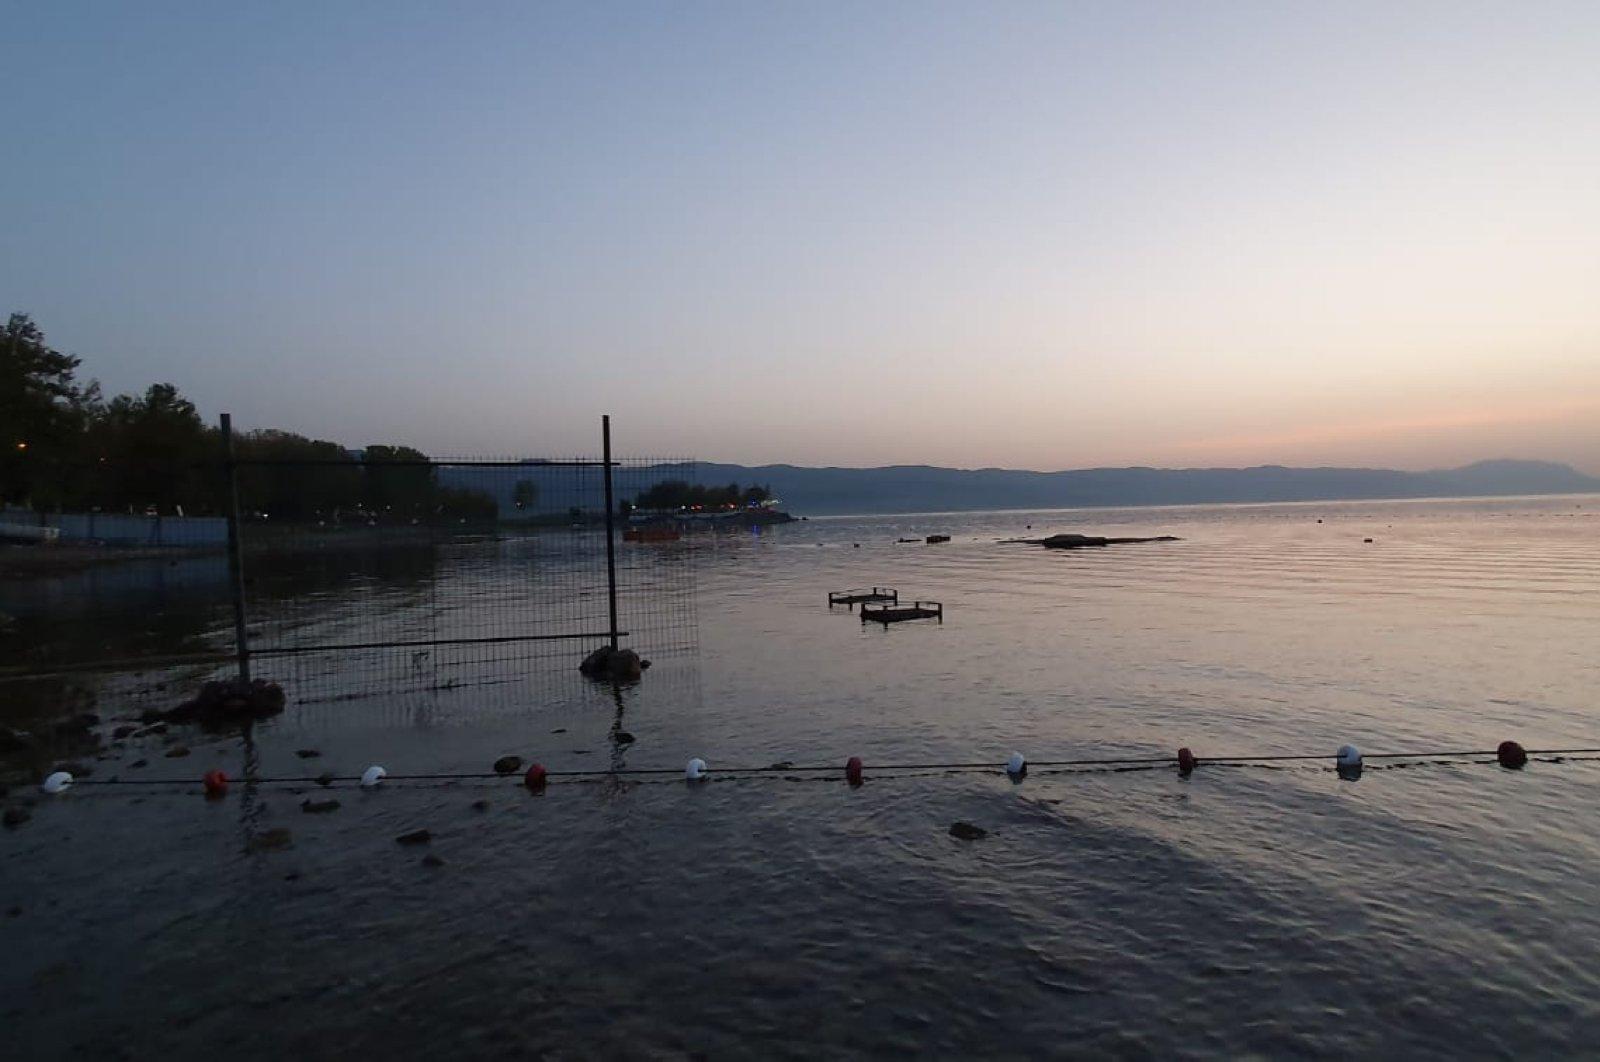 A shot from the filming continuing at Lake Iznik, Bursa, western Turkey, Oct. 4, 2020. (AA PHOTO)